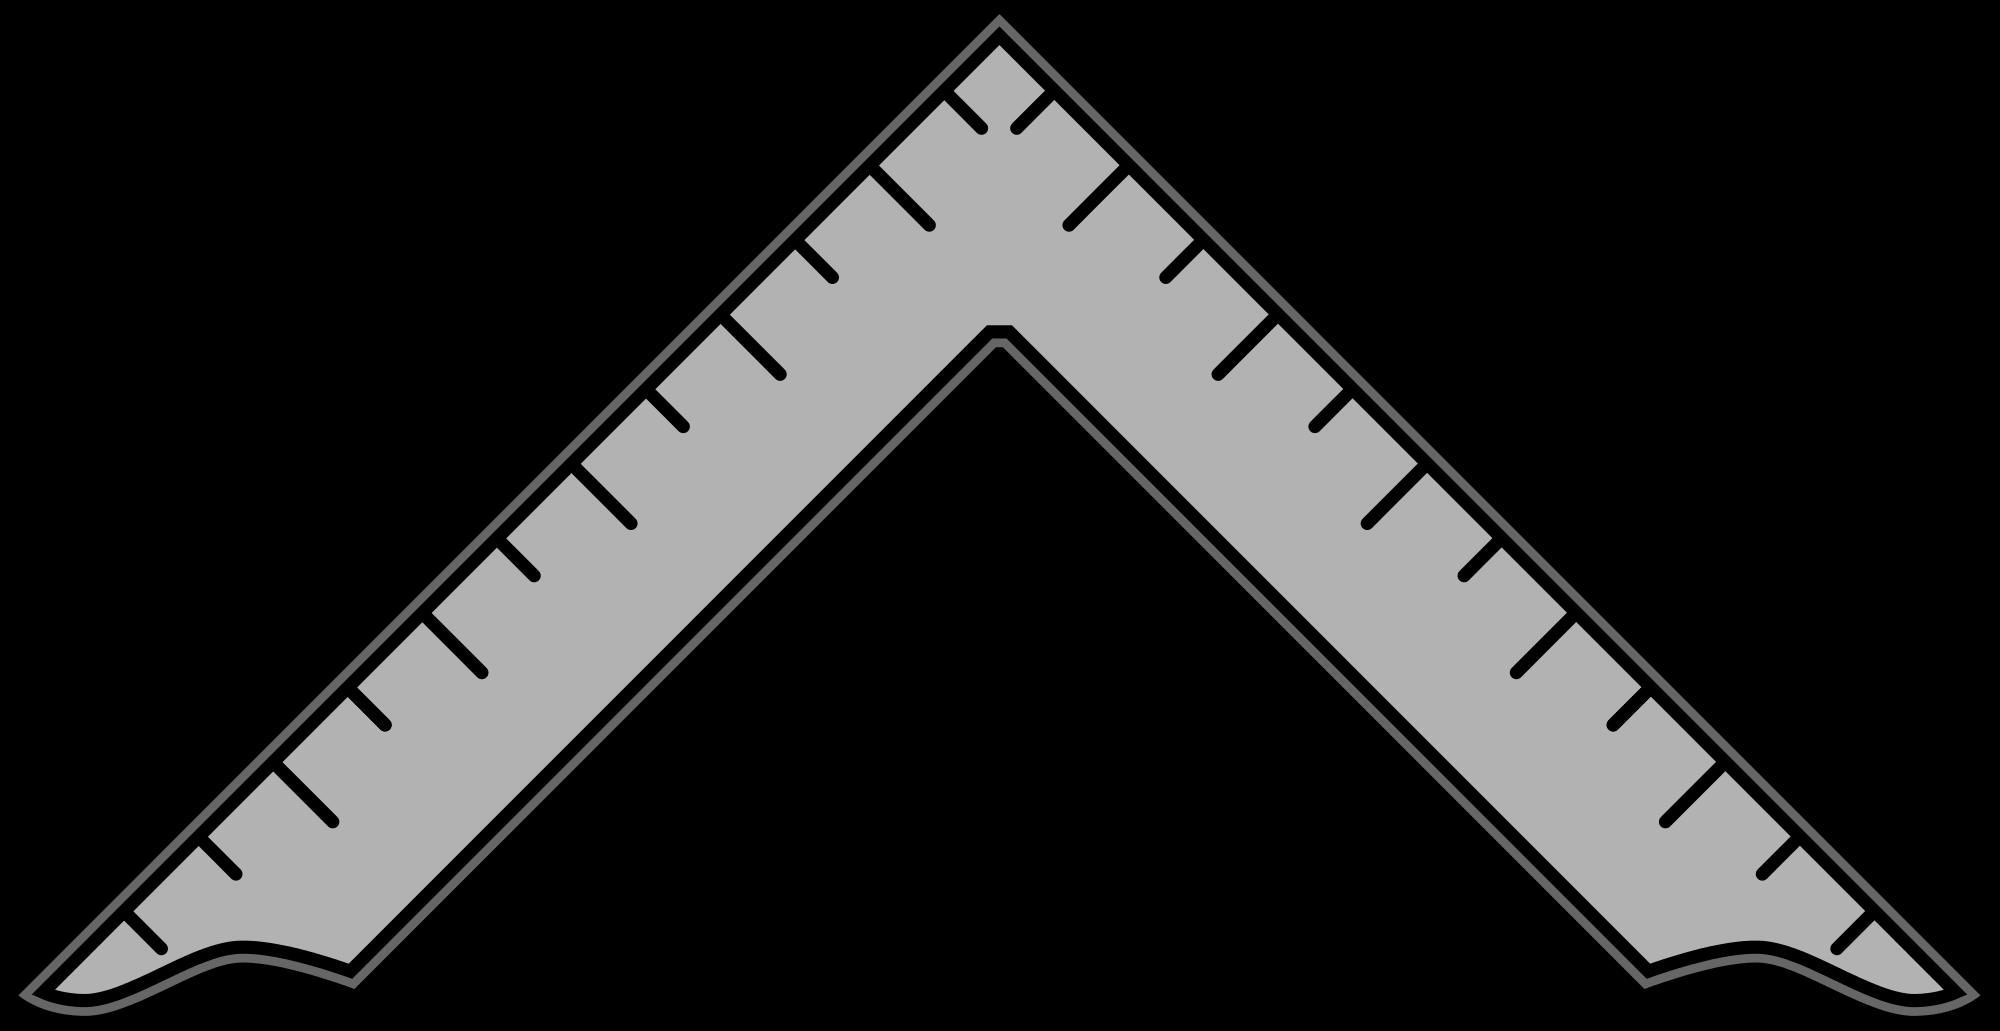 Masonic svg #10, Download drawings